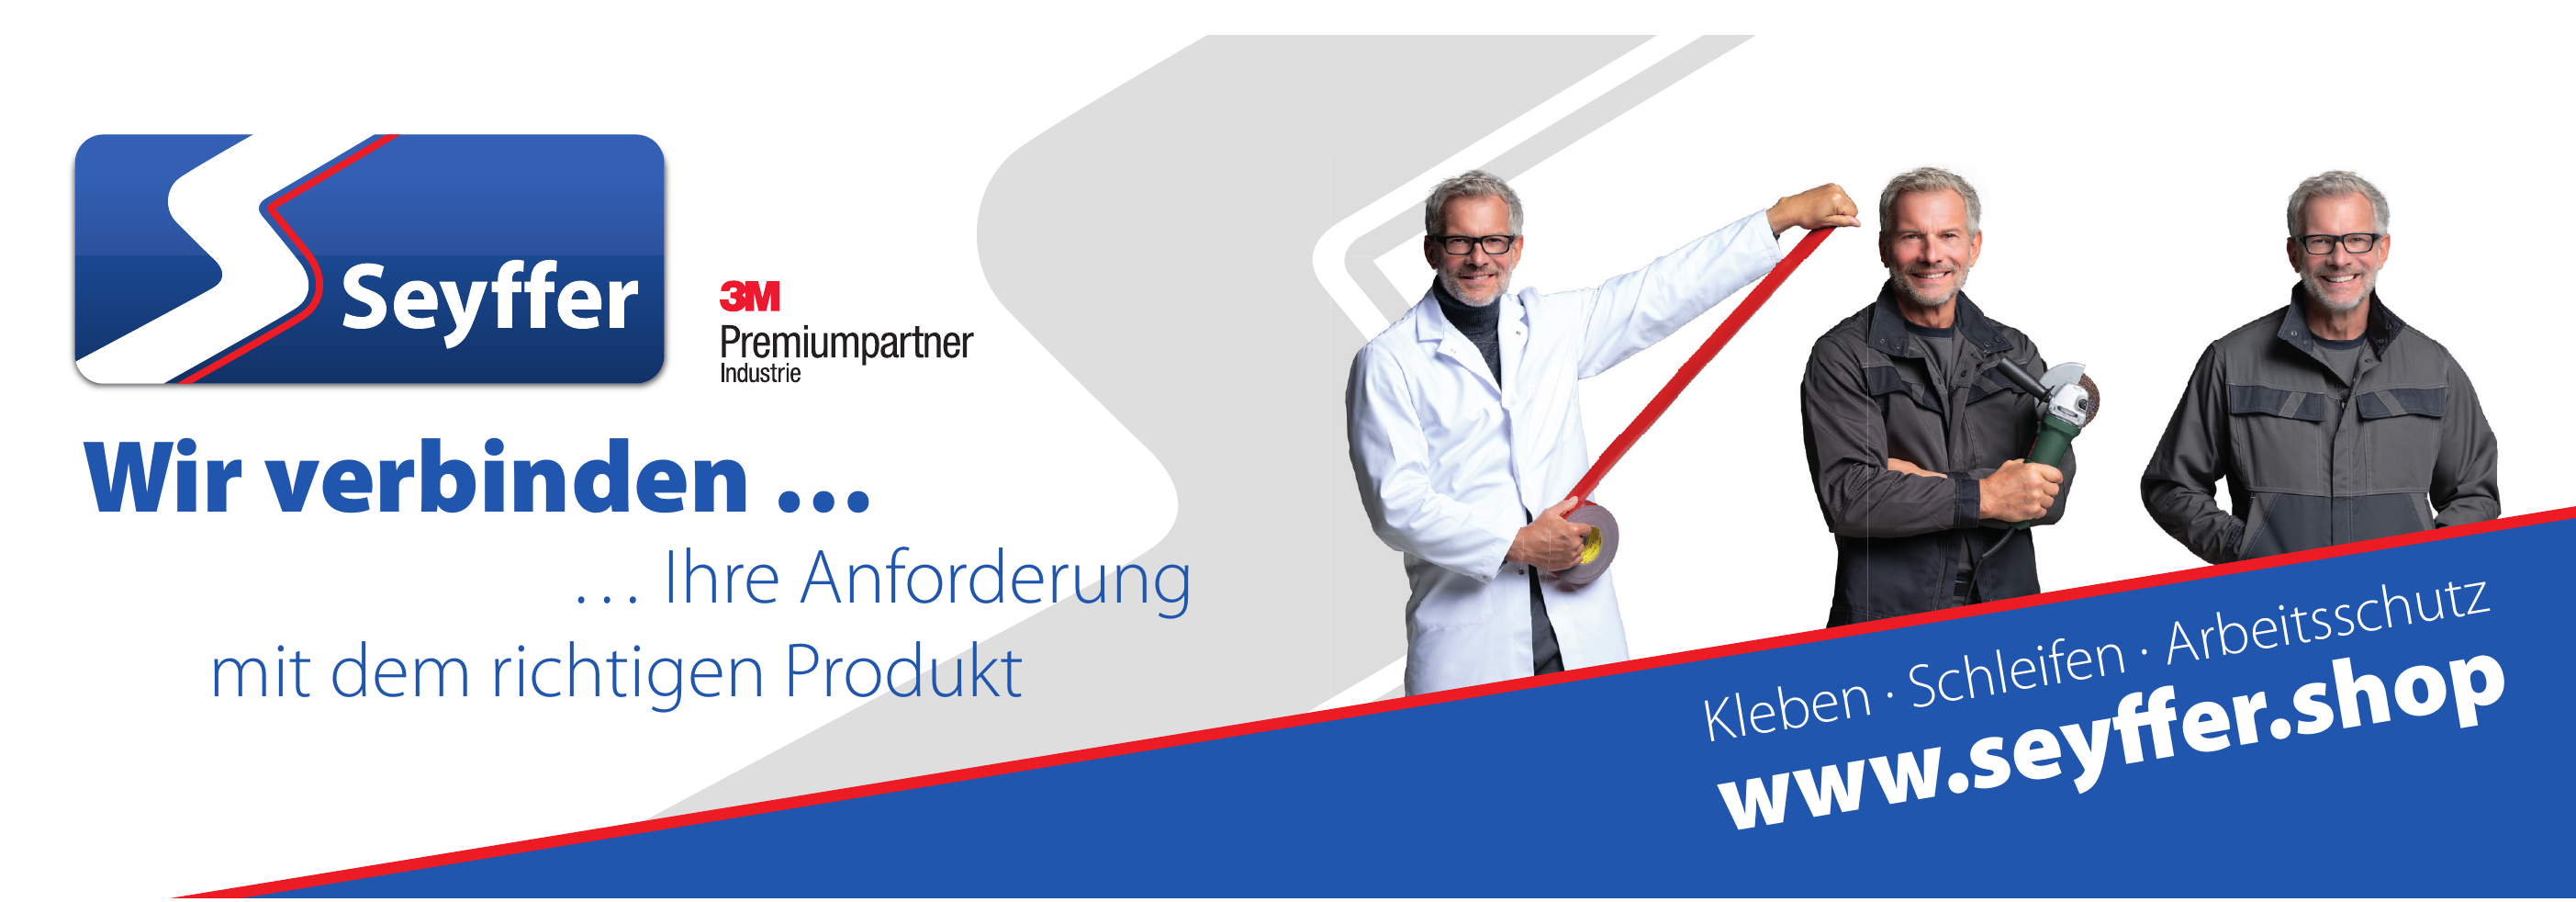 Seyffer GmbH